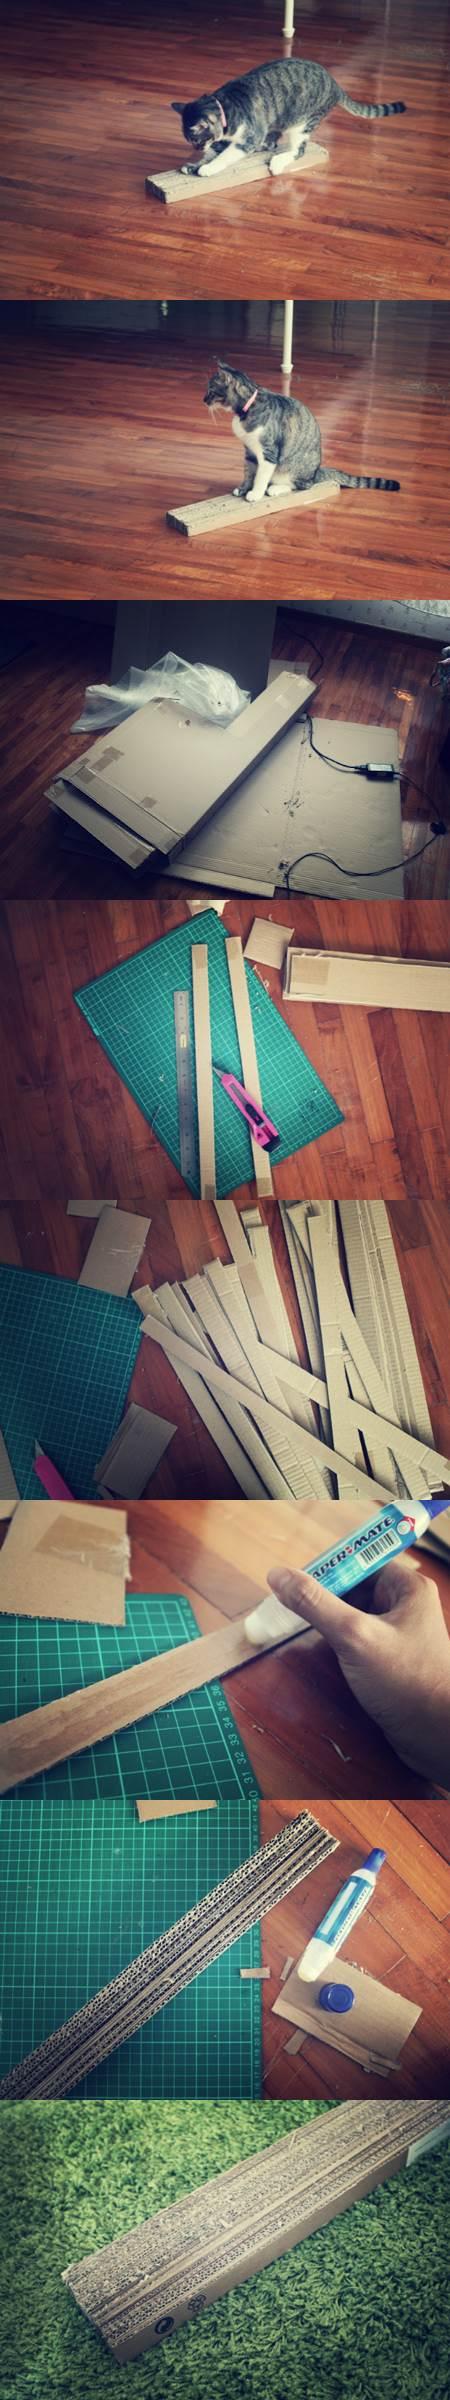 DIY Cardboard Scratch Pad 2